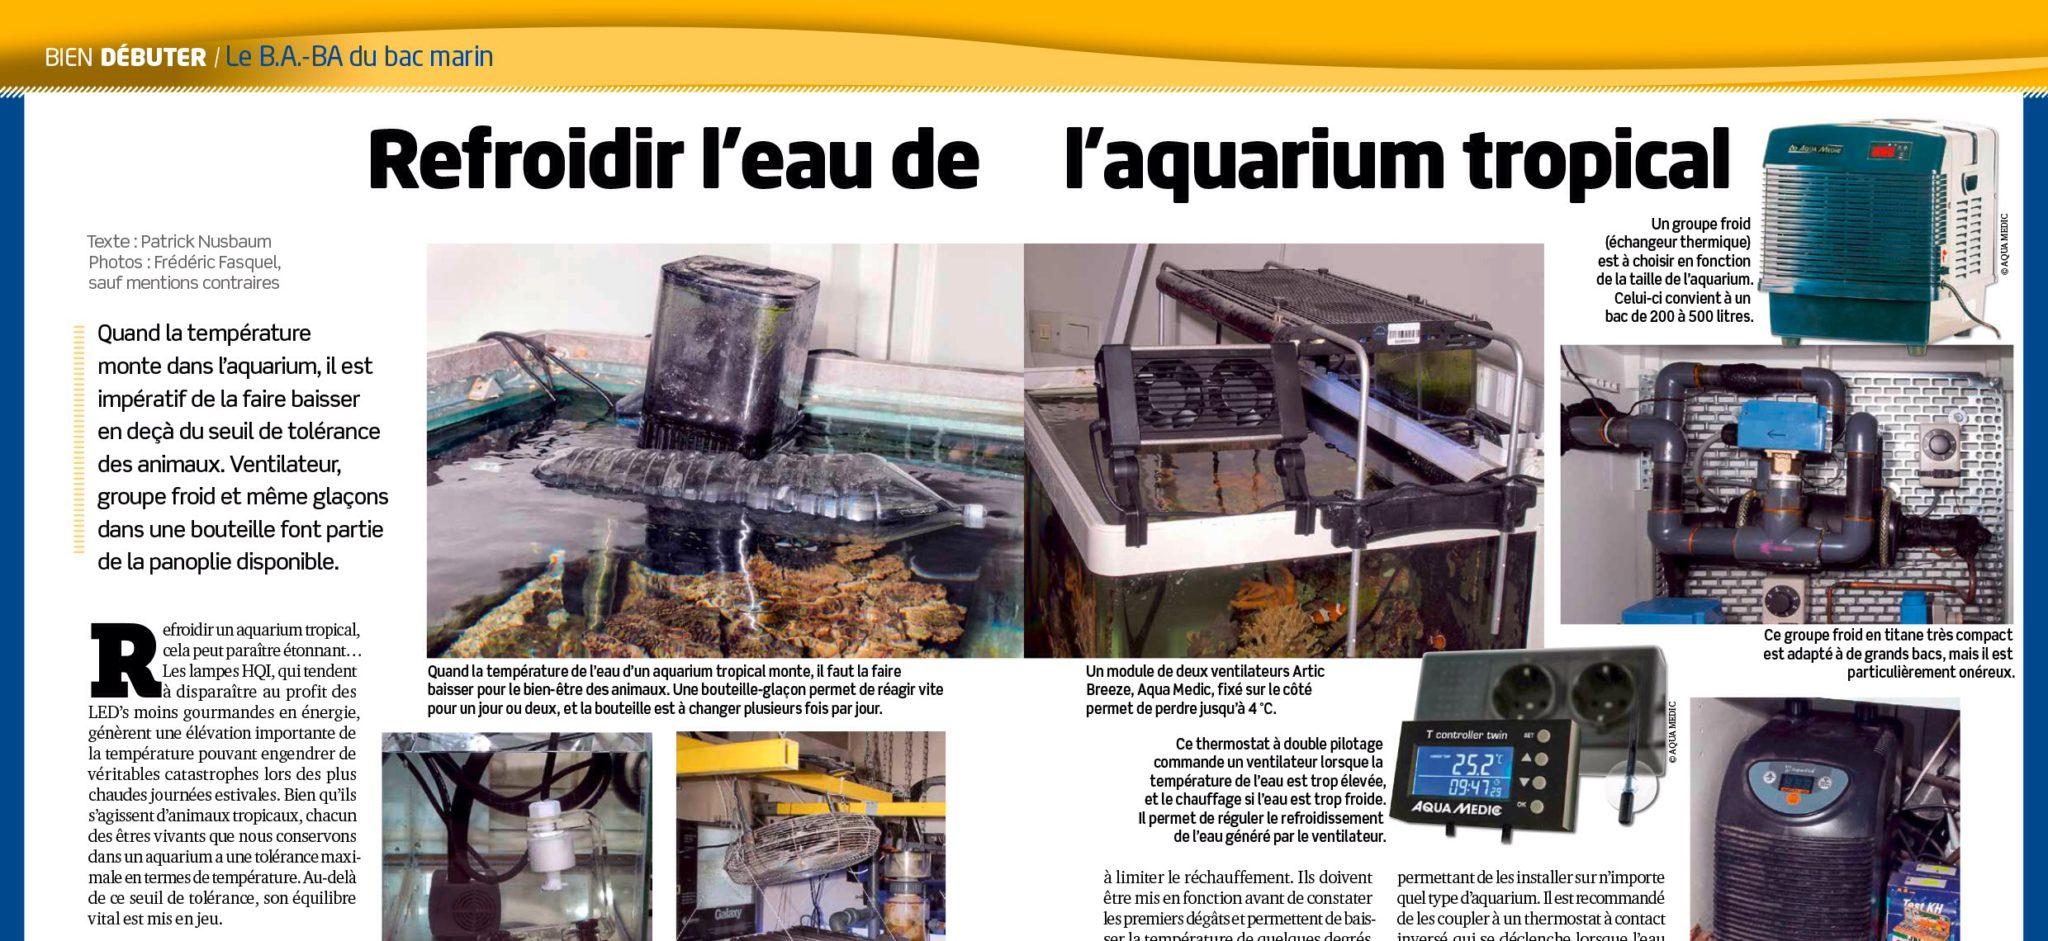 Aquarium la maison 122 refroidir son aquarium for Aquarium a la maison